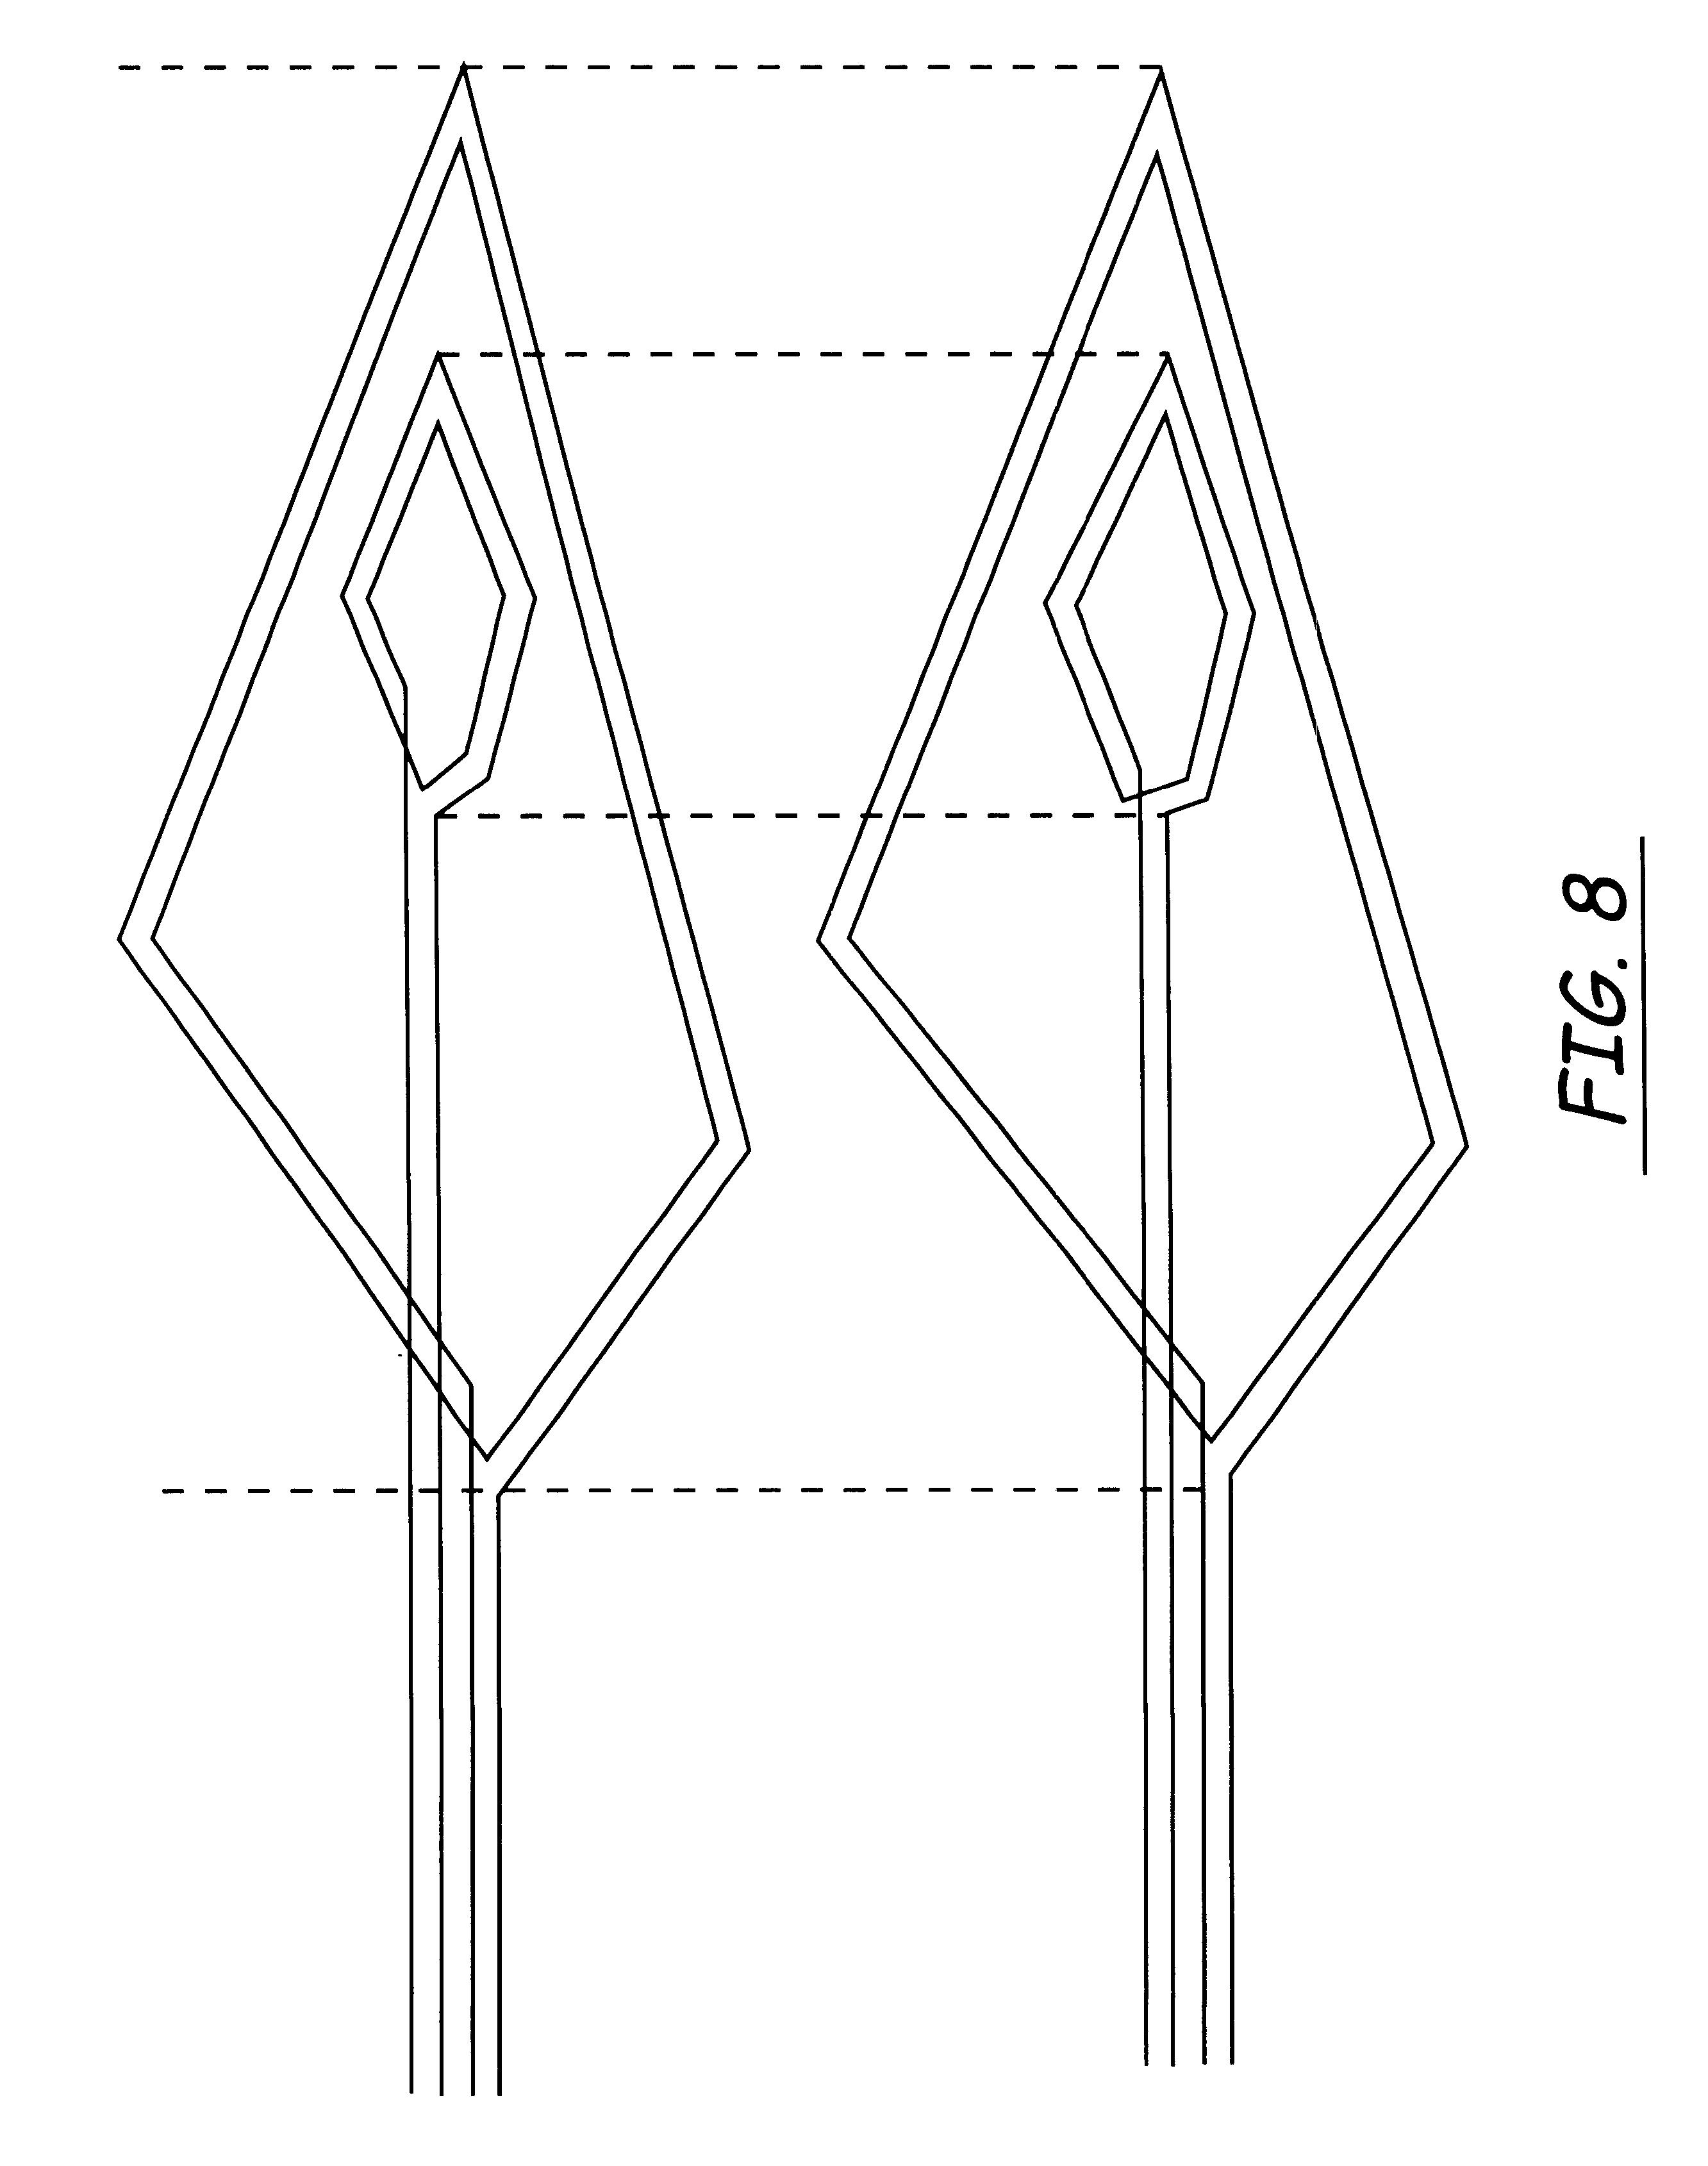 patente us6463329